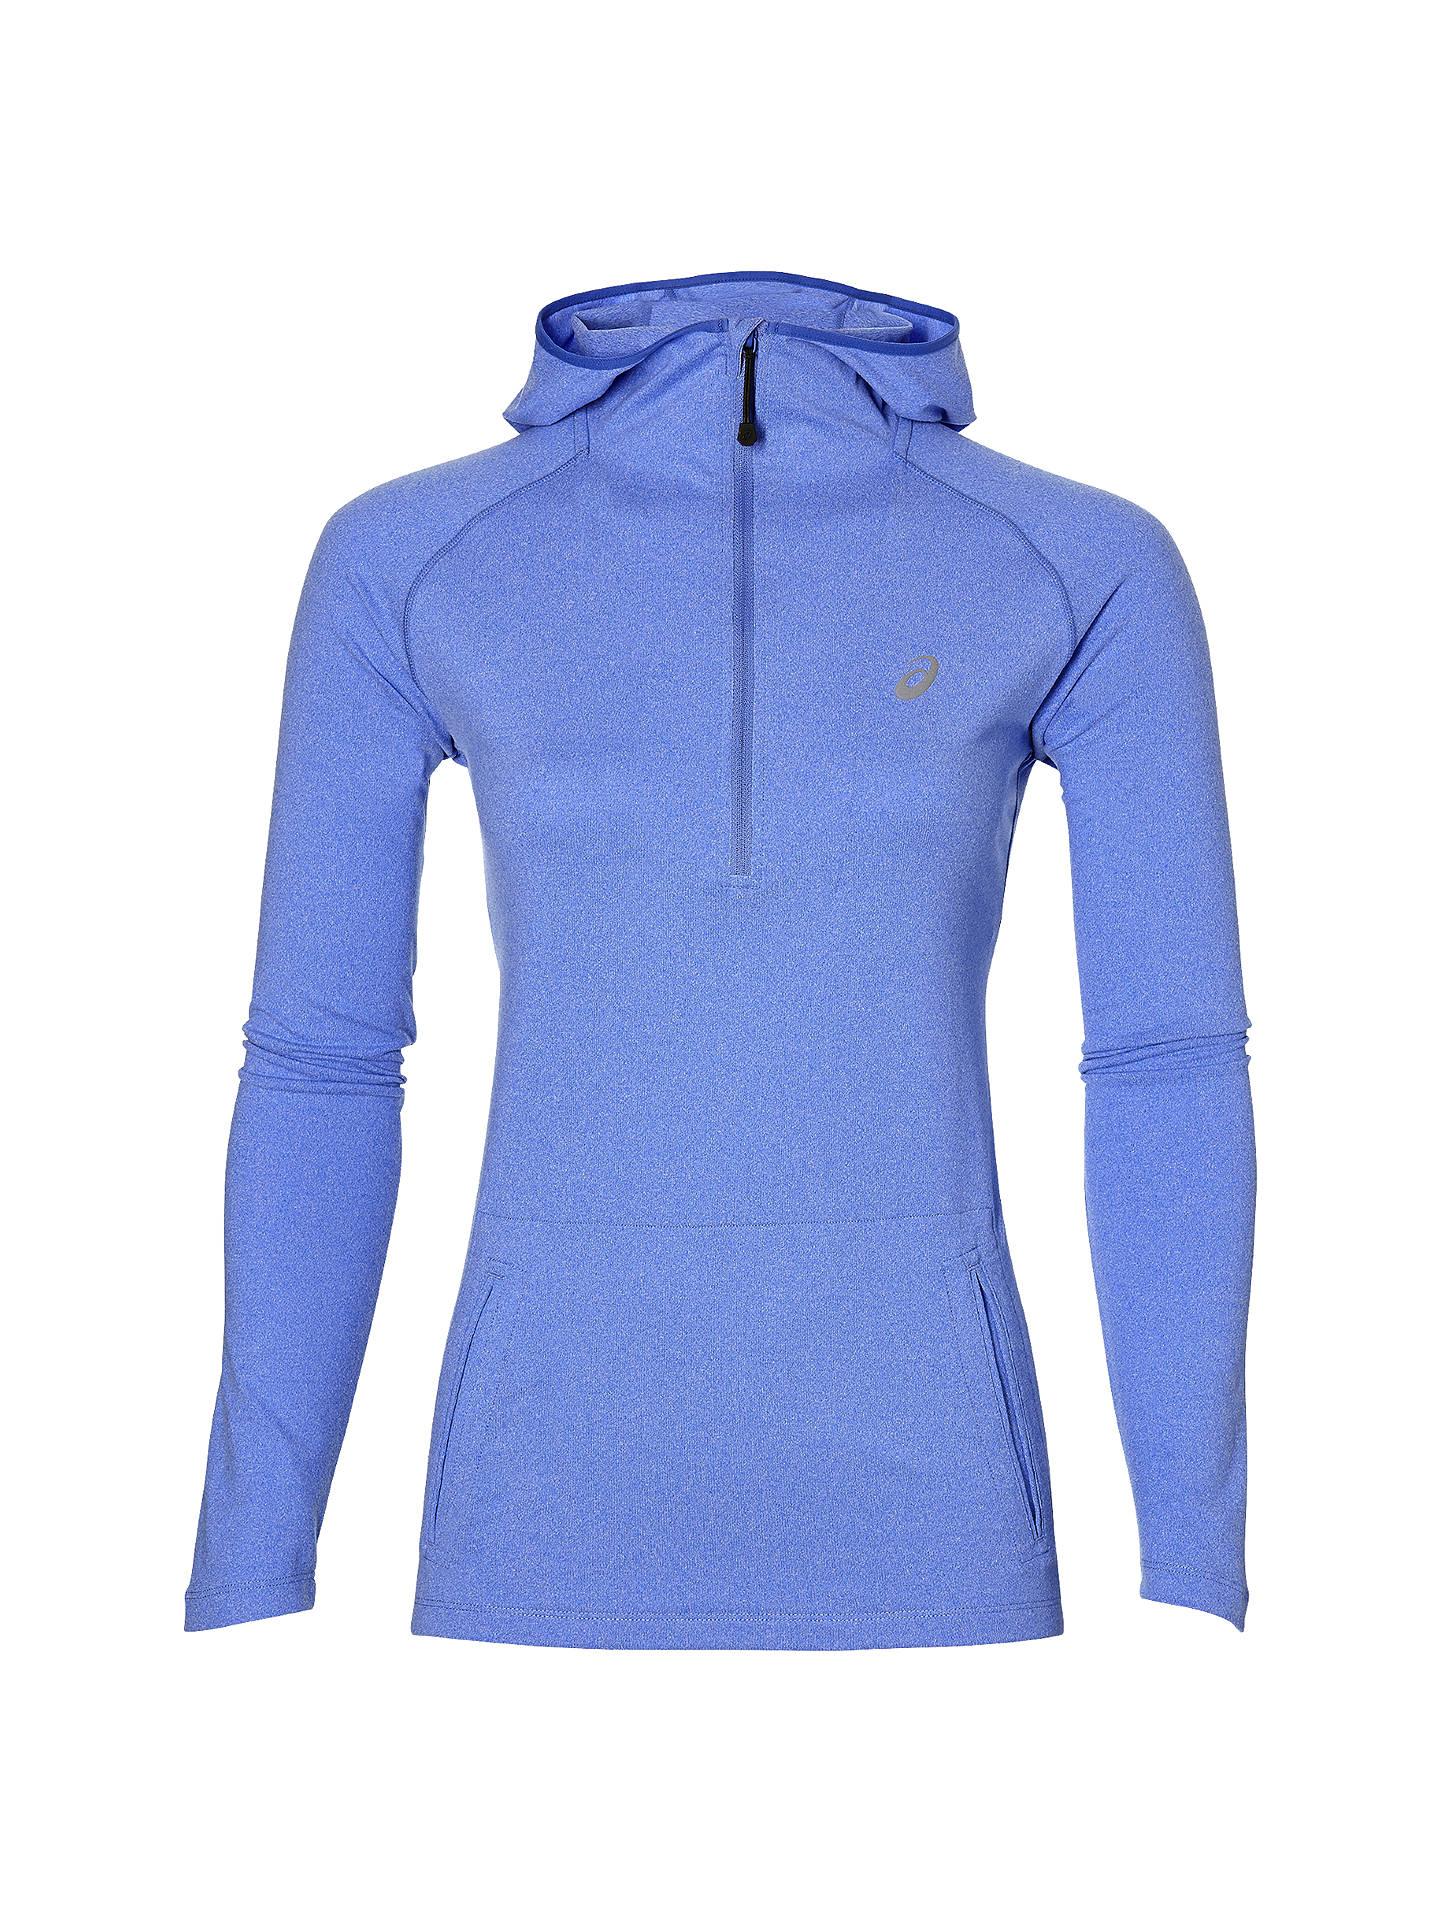 271e67934c29 Buy Asics Women s Long Sleeve Running Hoodie